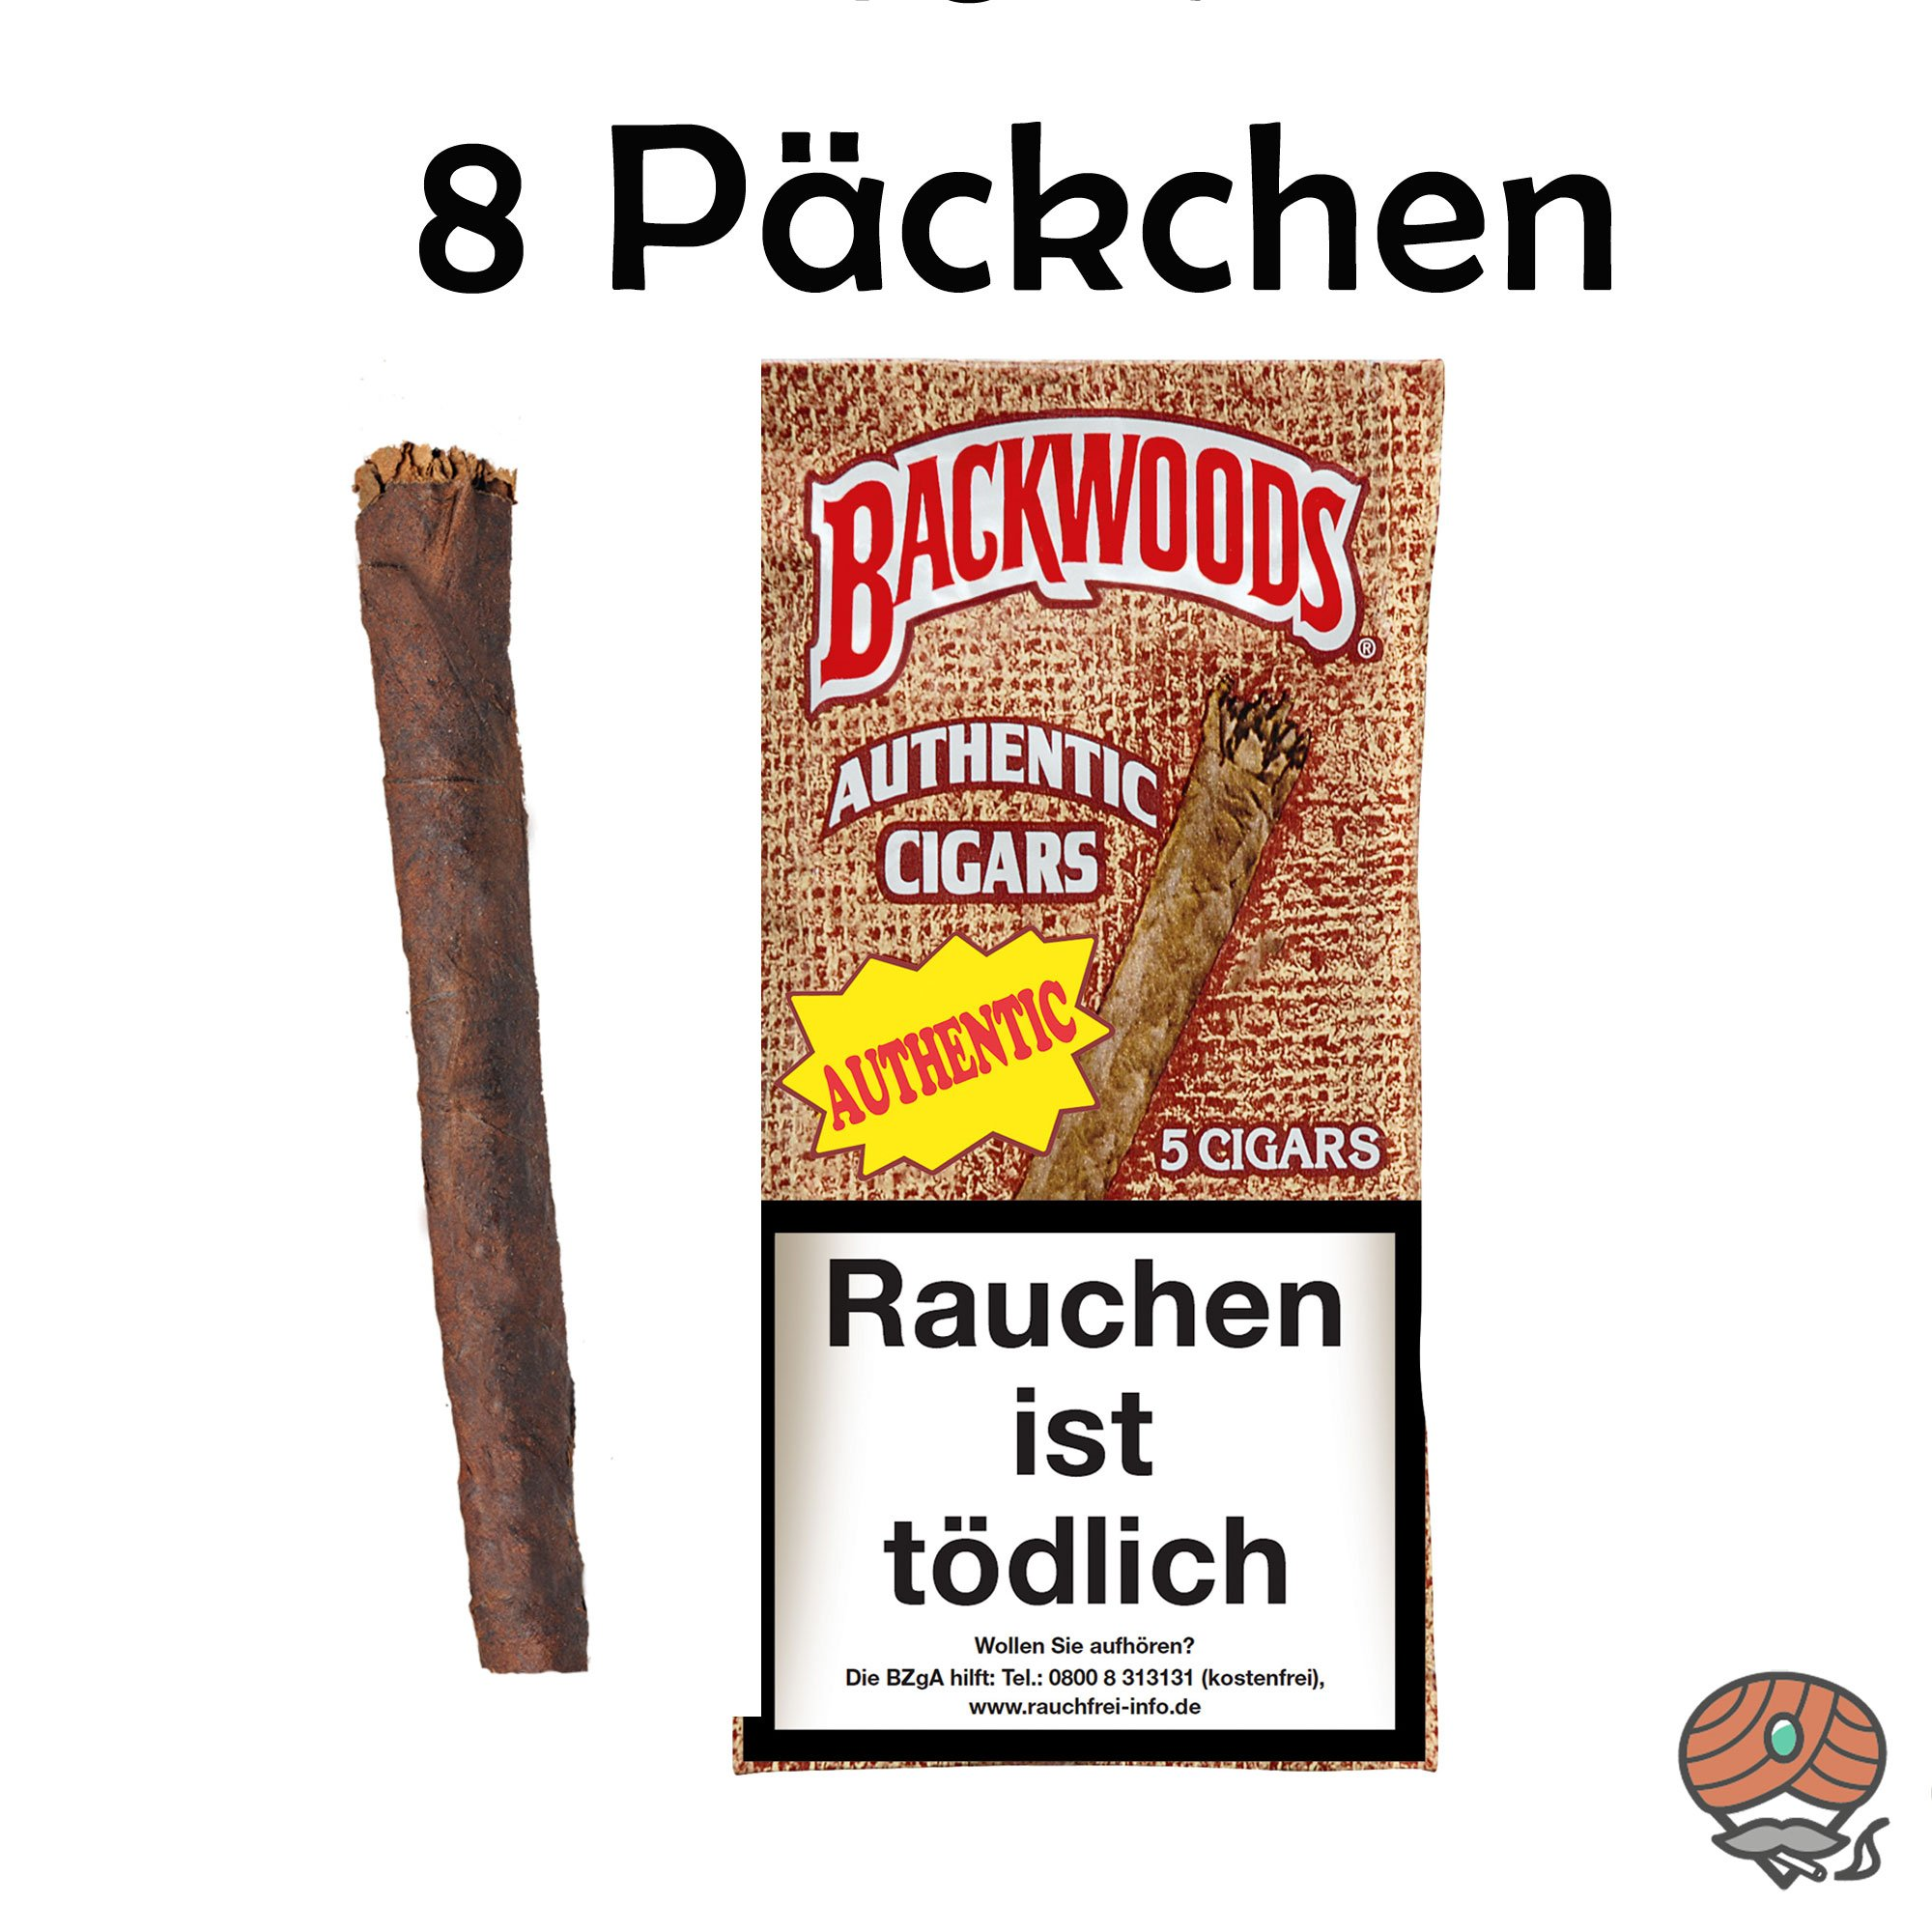 8 Päckchen Backwoods Authentic Cigars à 5 Stück 100% Tabak im Humipack